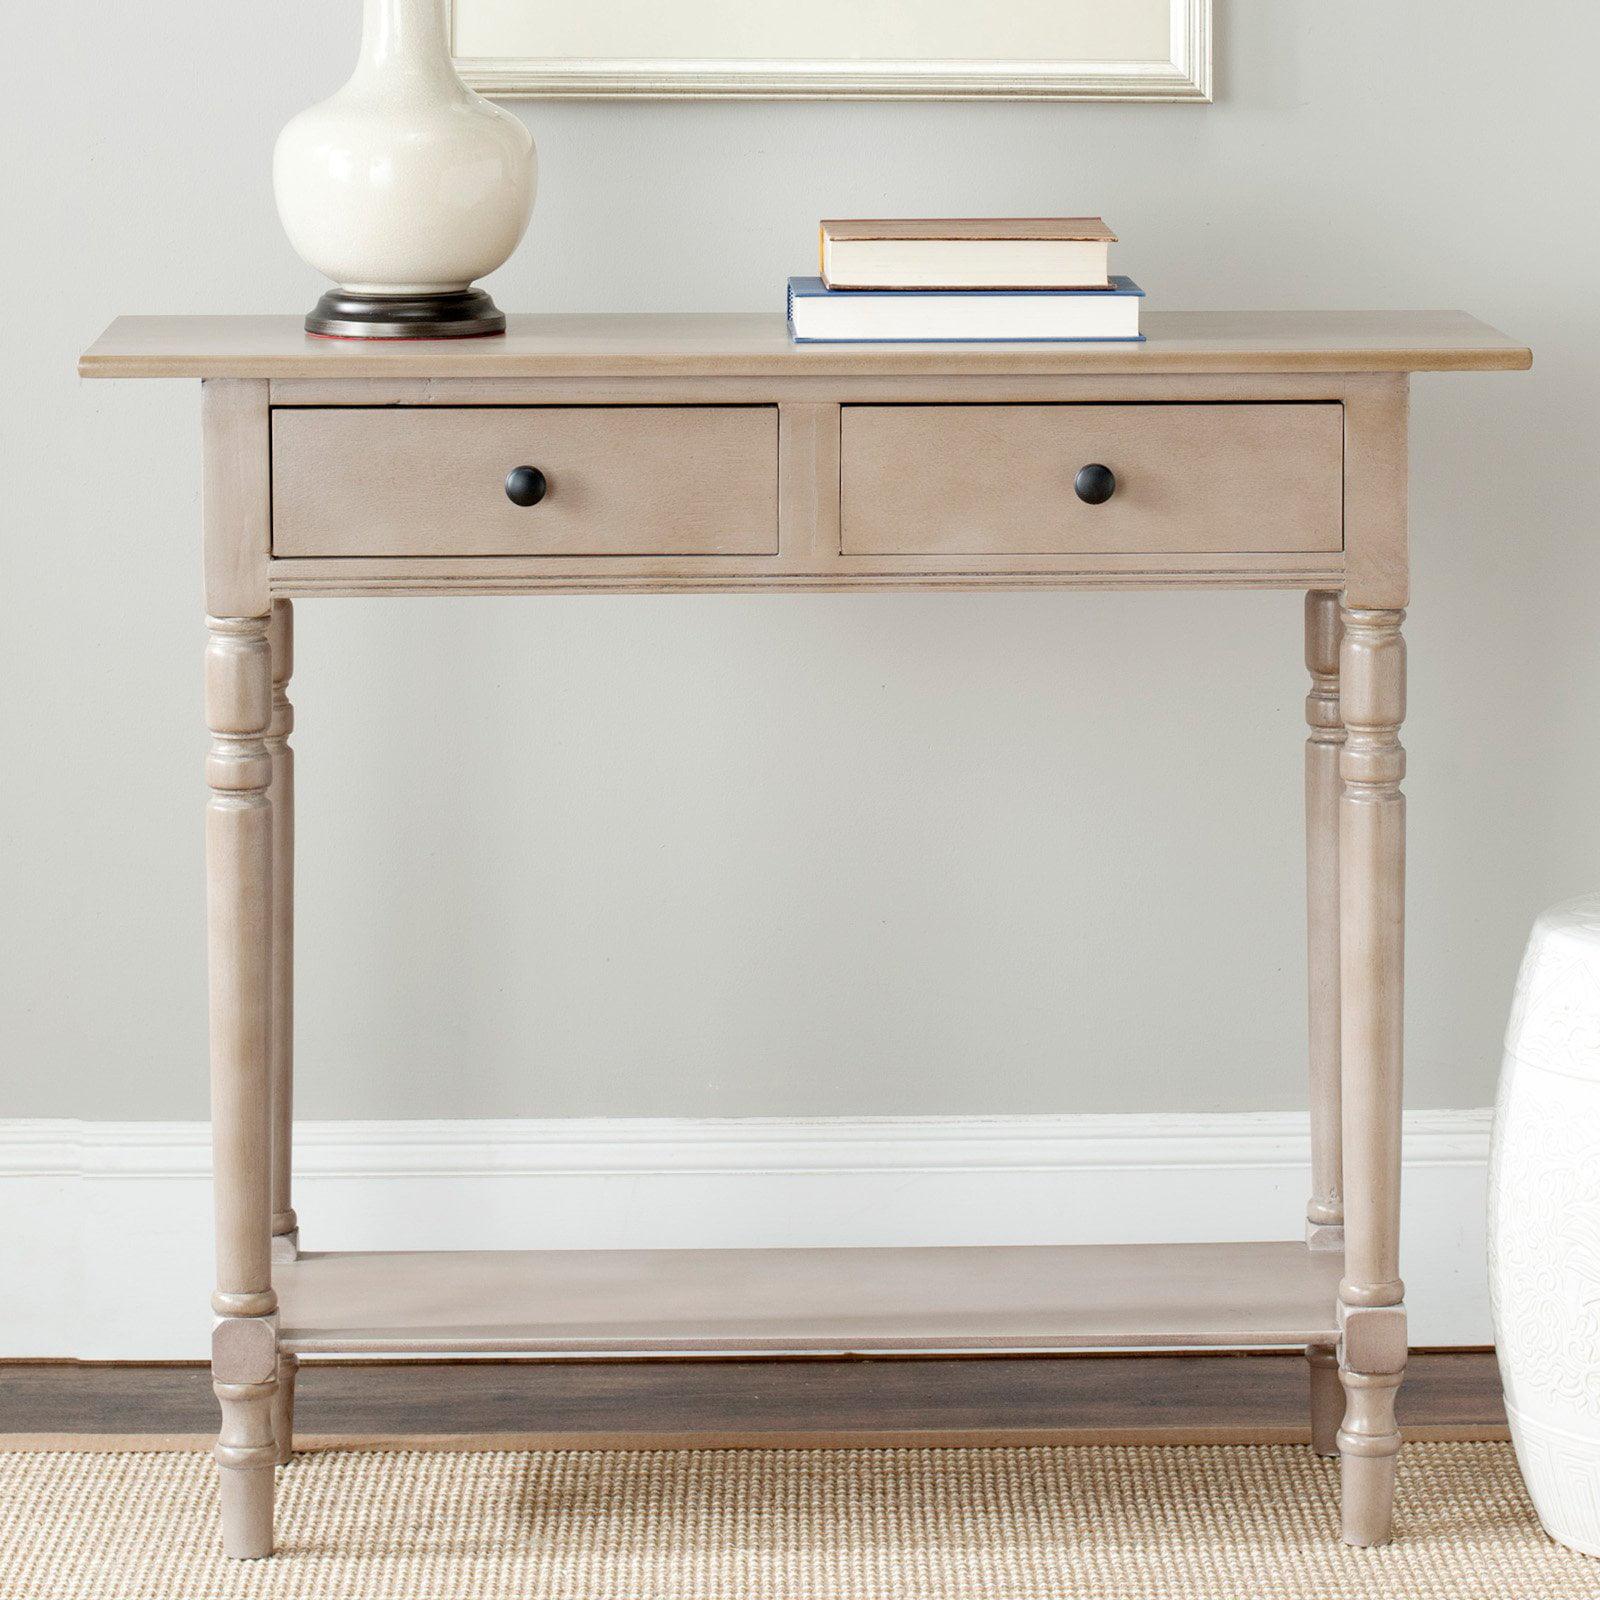 Safavieh Rosemary Console Table